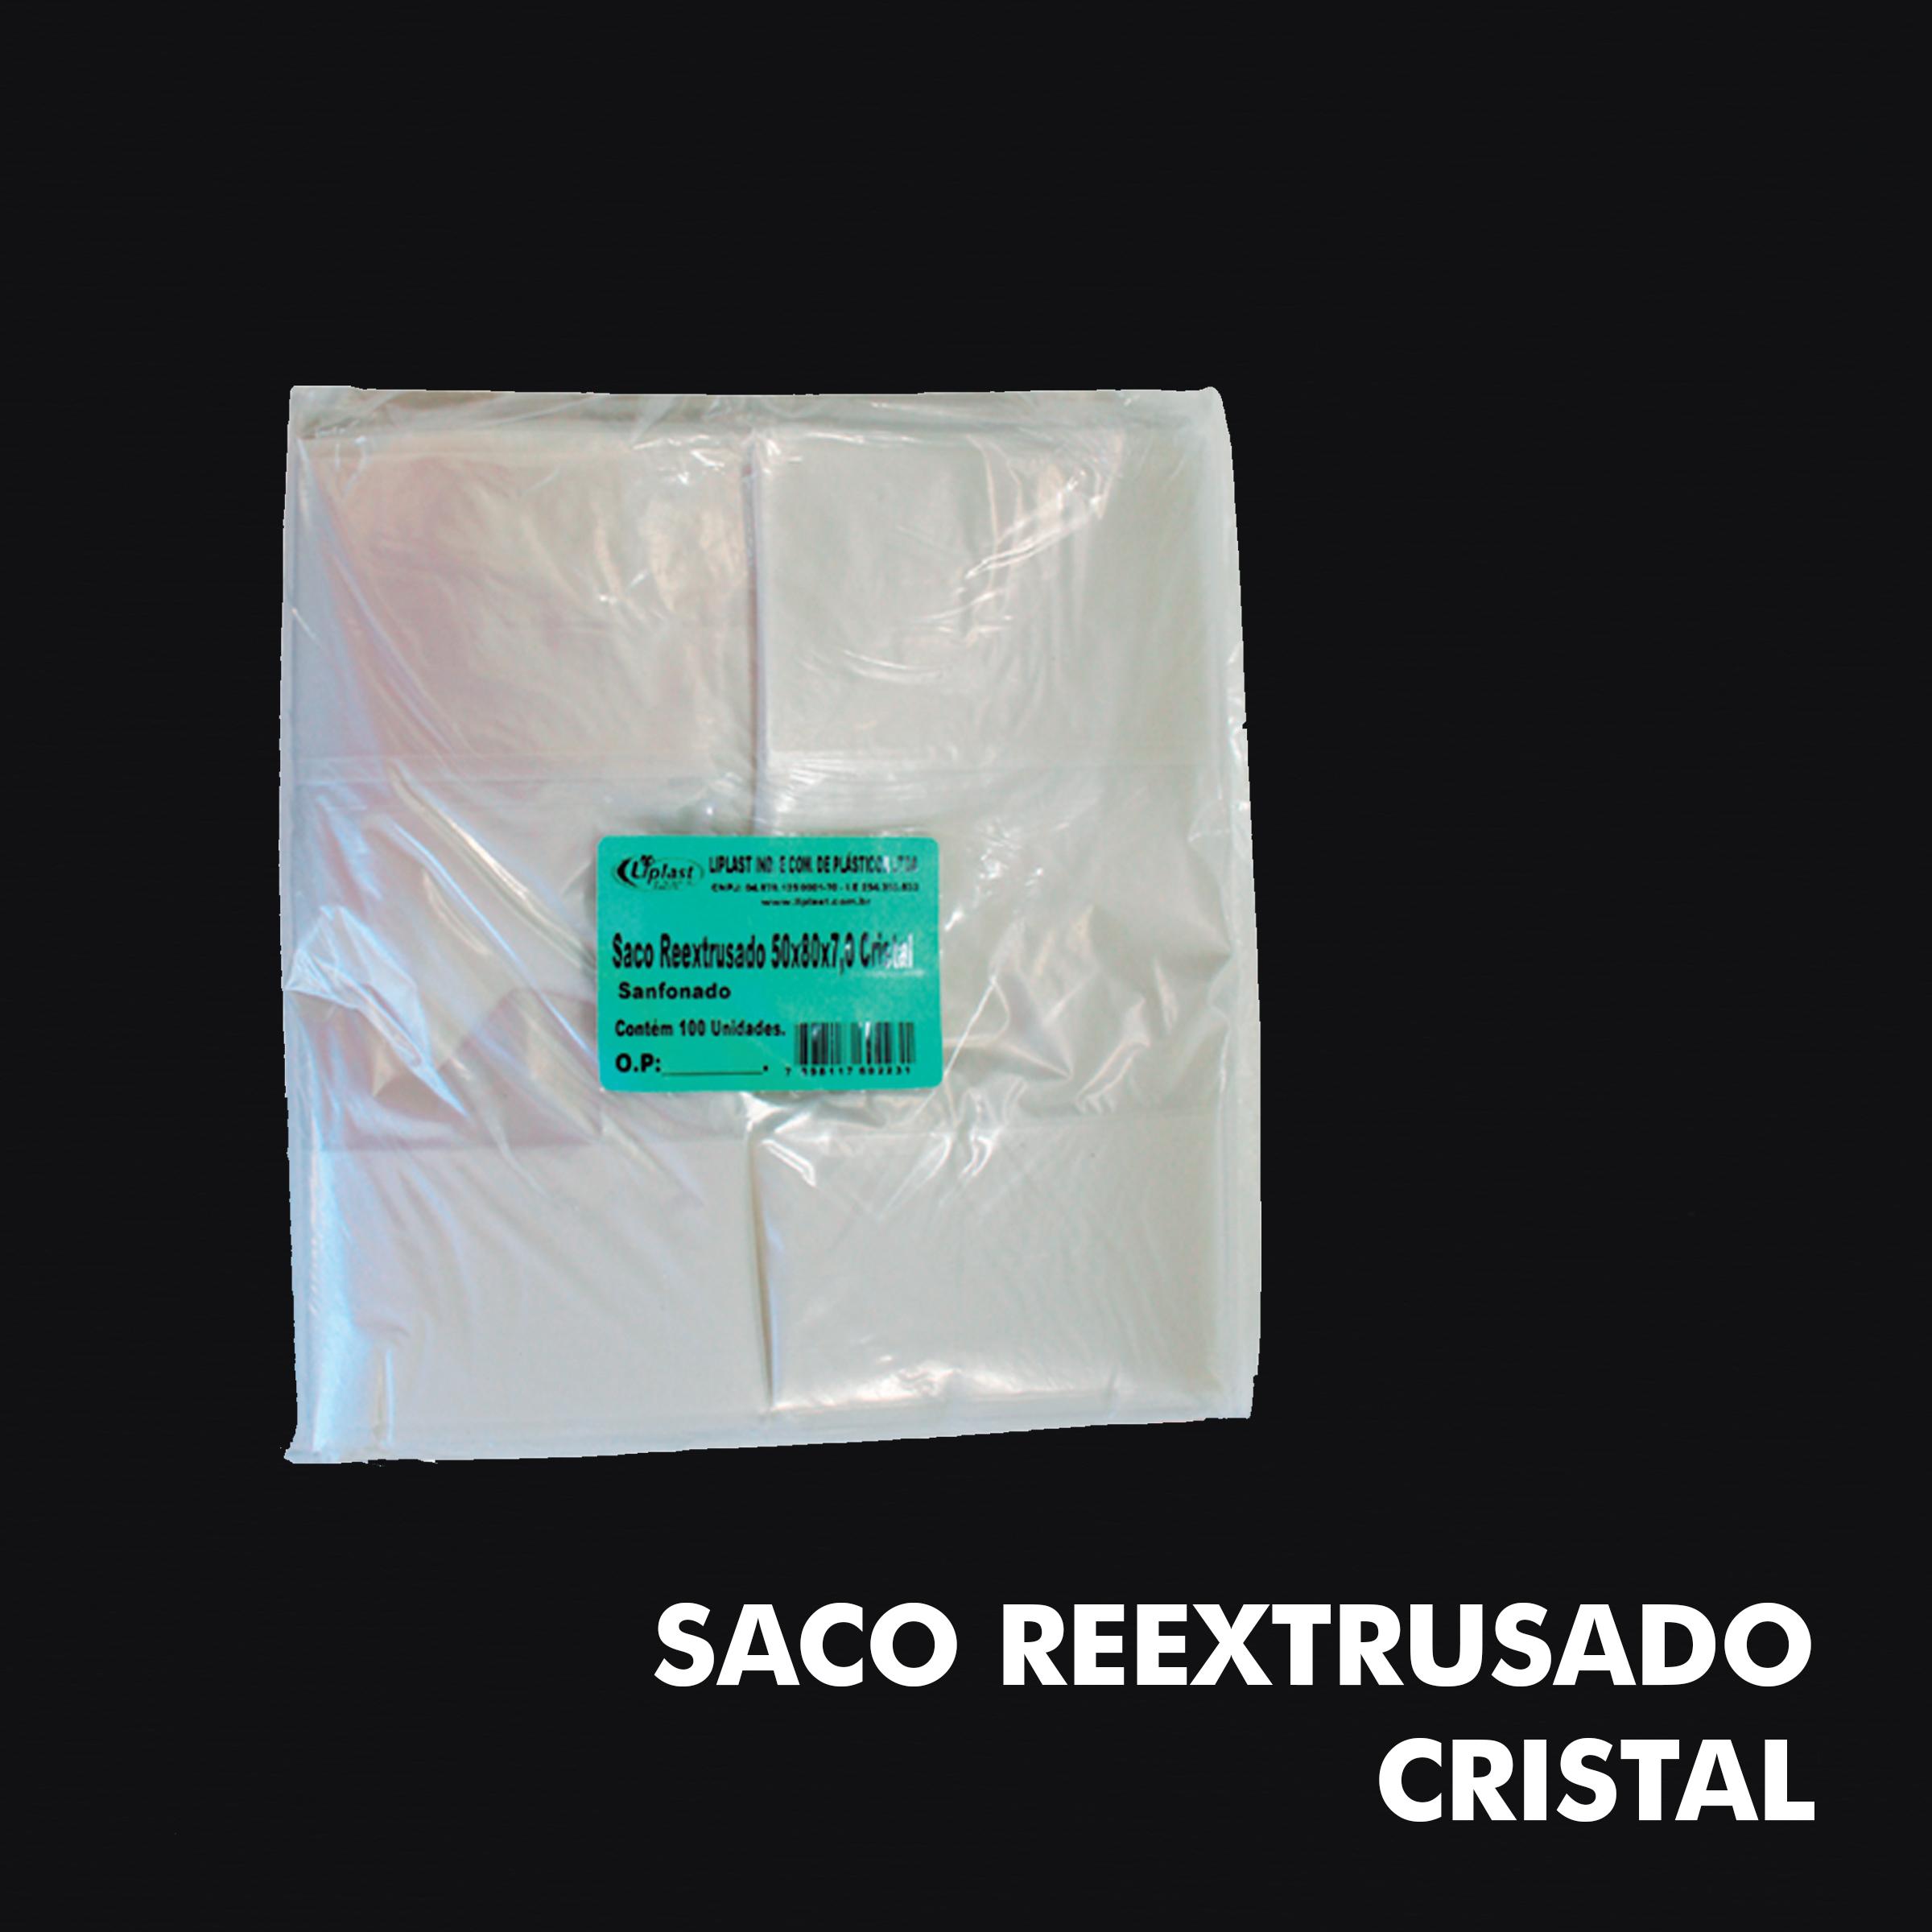 Saco Reextrusado Cristal - RF